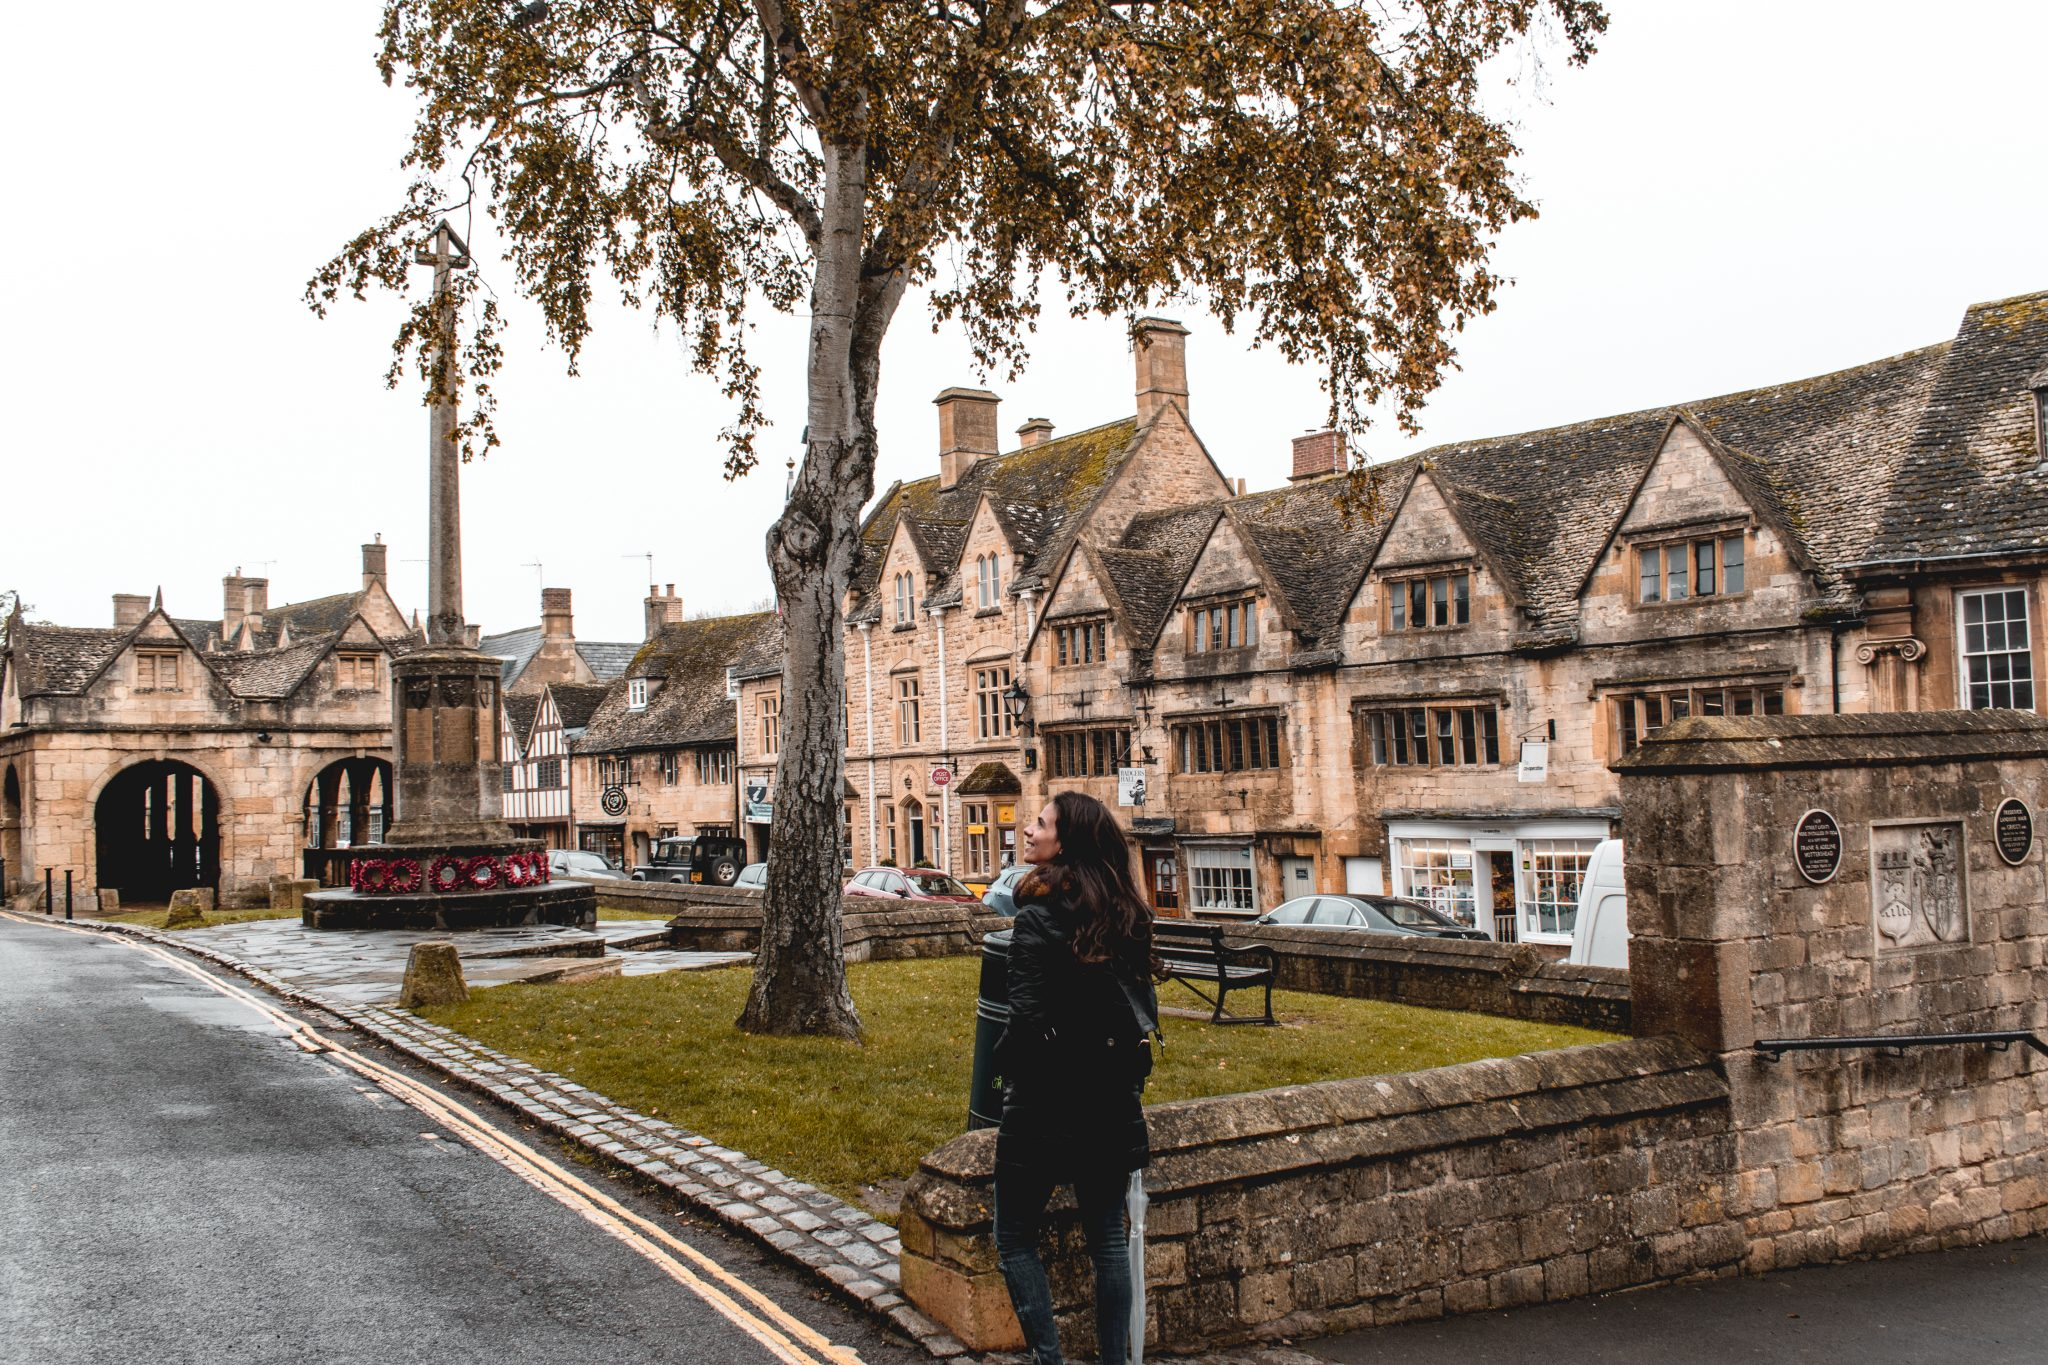 Cotswolds na Inglaterra